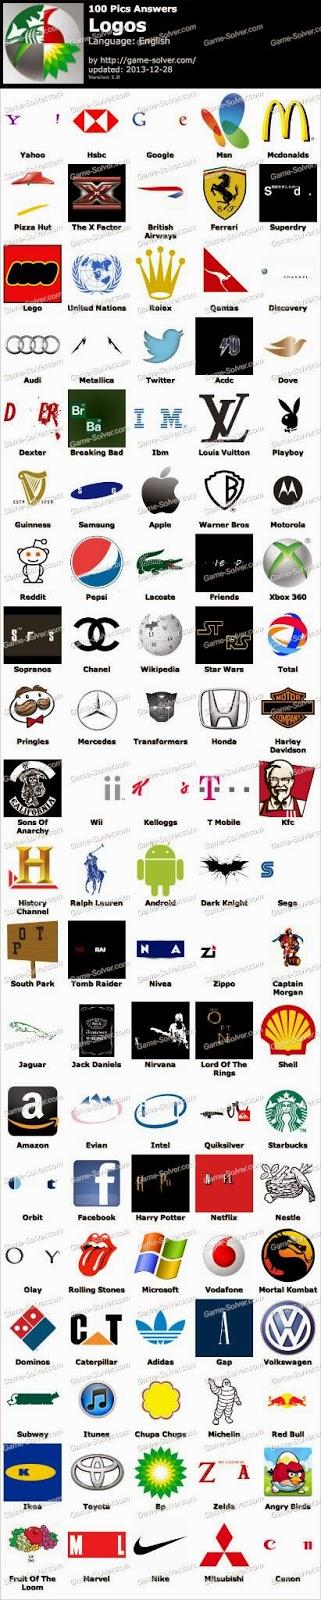 100 Pics Logo 91 : Logos, PictureMeta